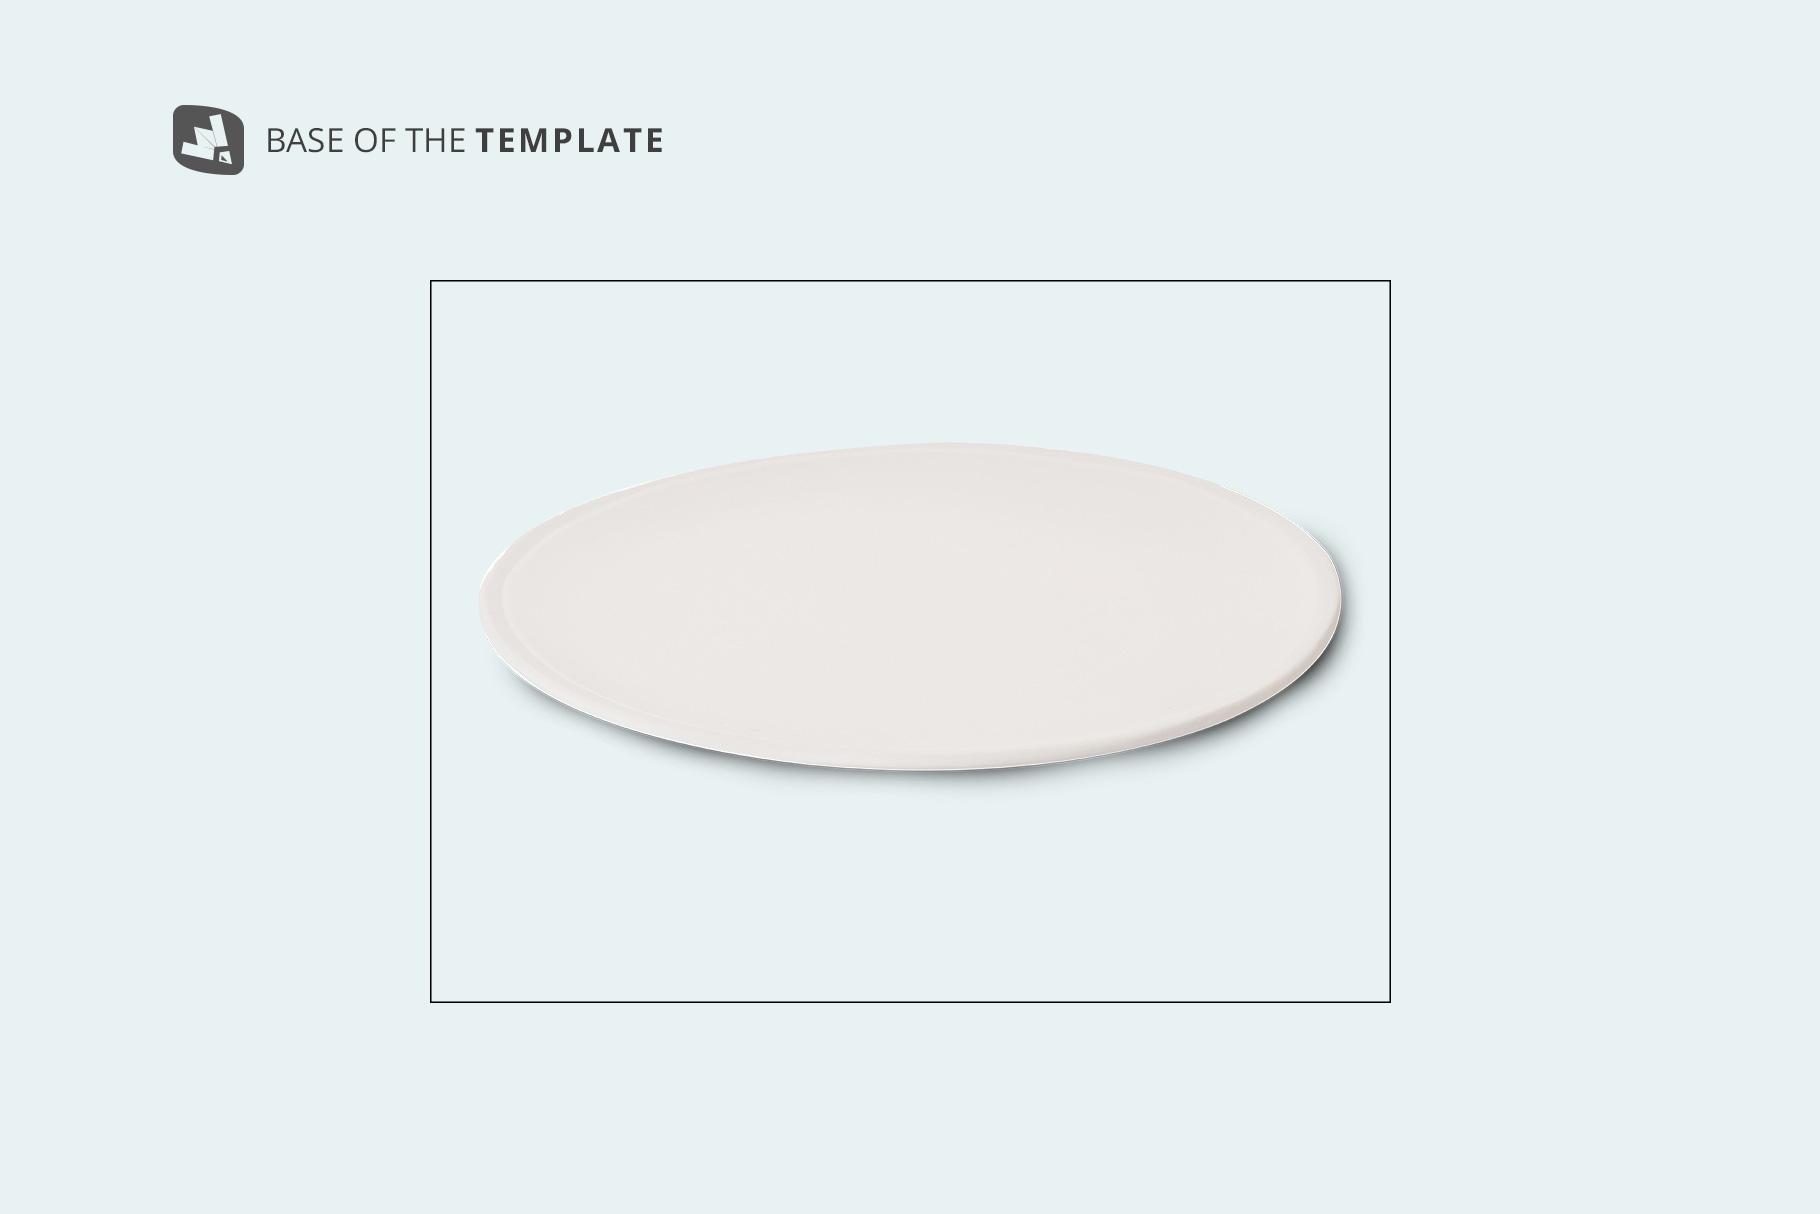 base image of the single ceramic dinner plate mockup